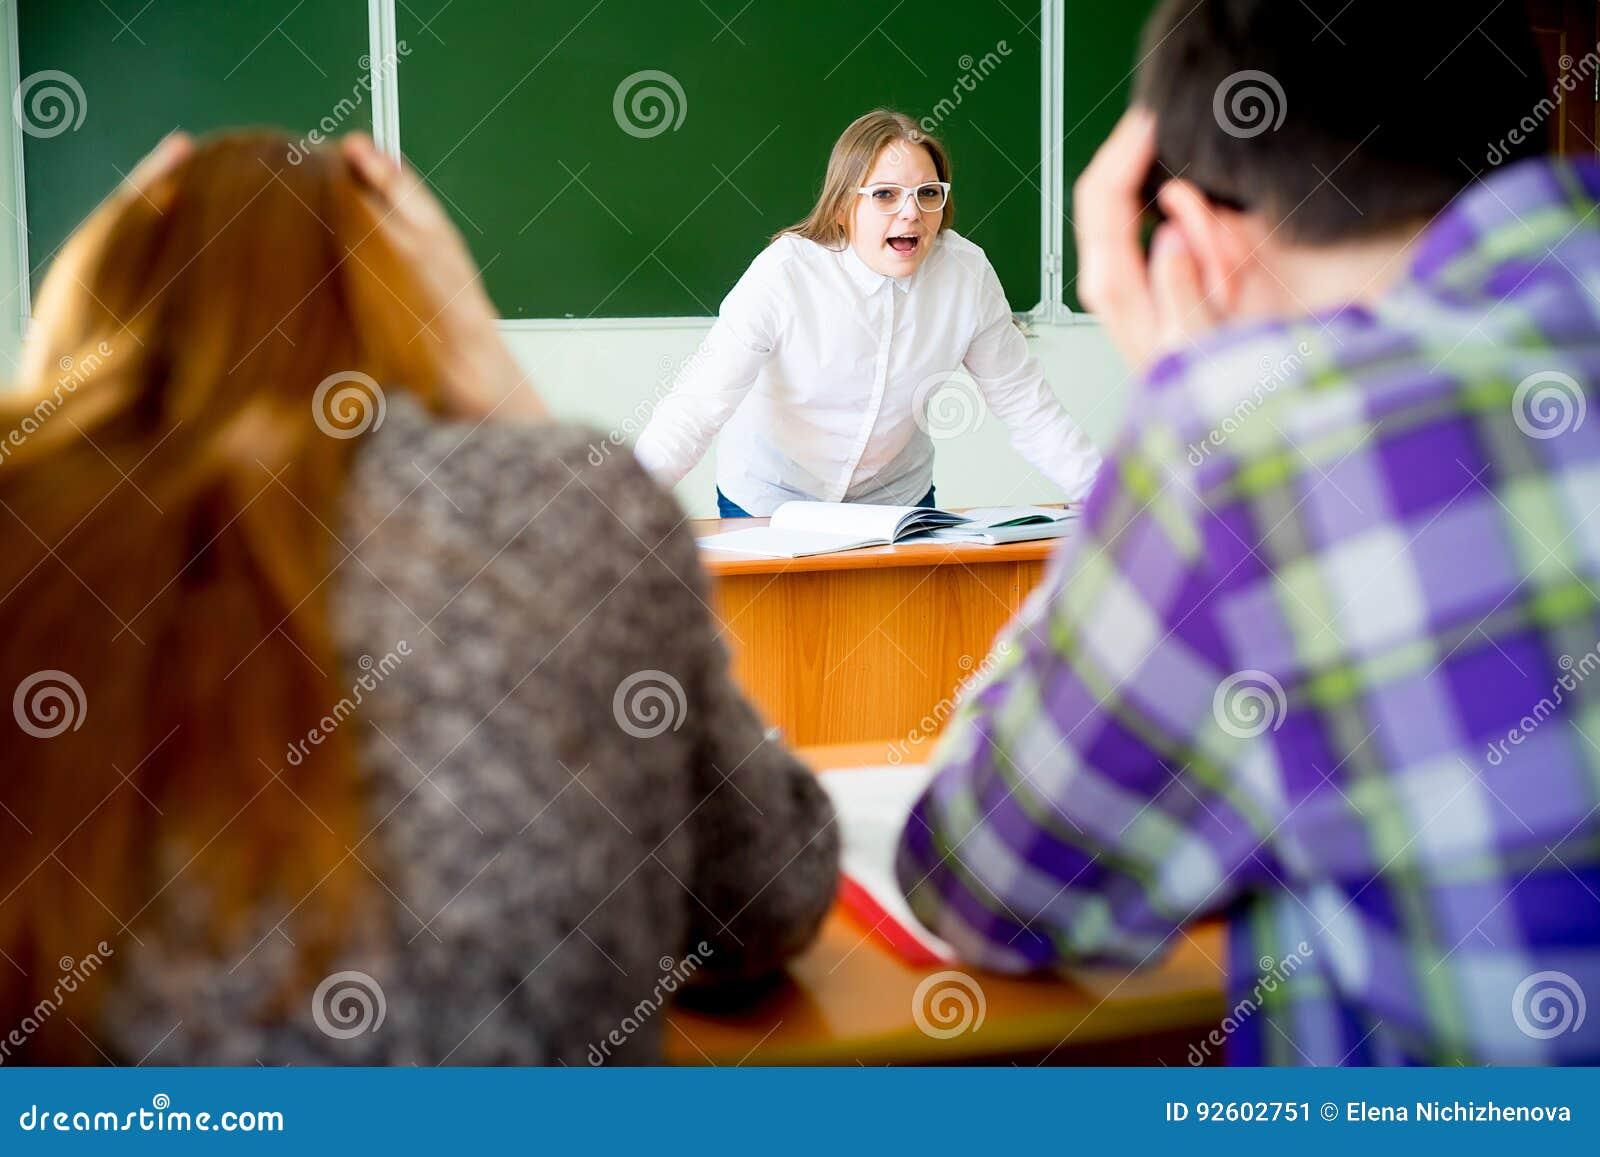 Angry teacher yelling